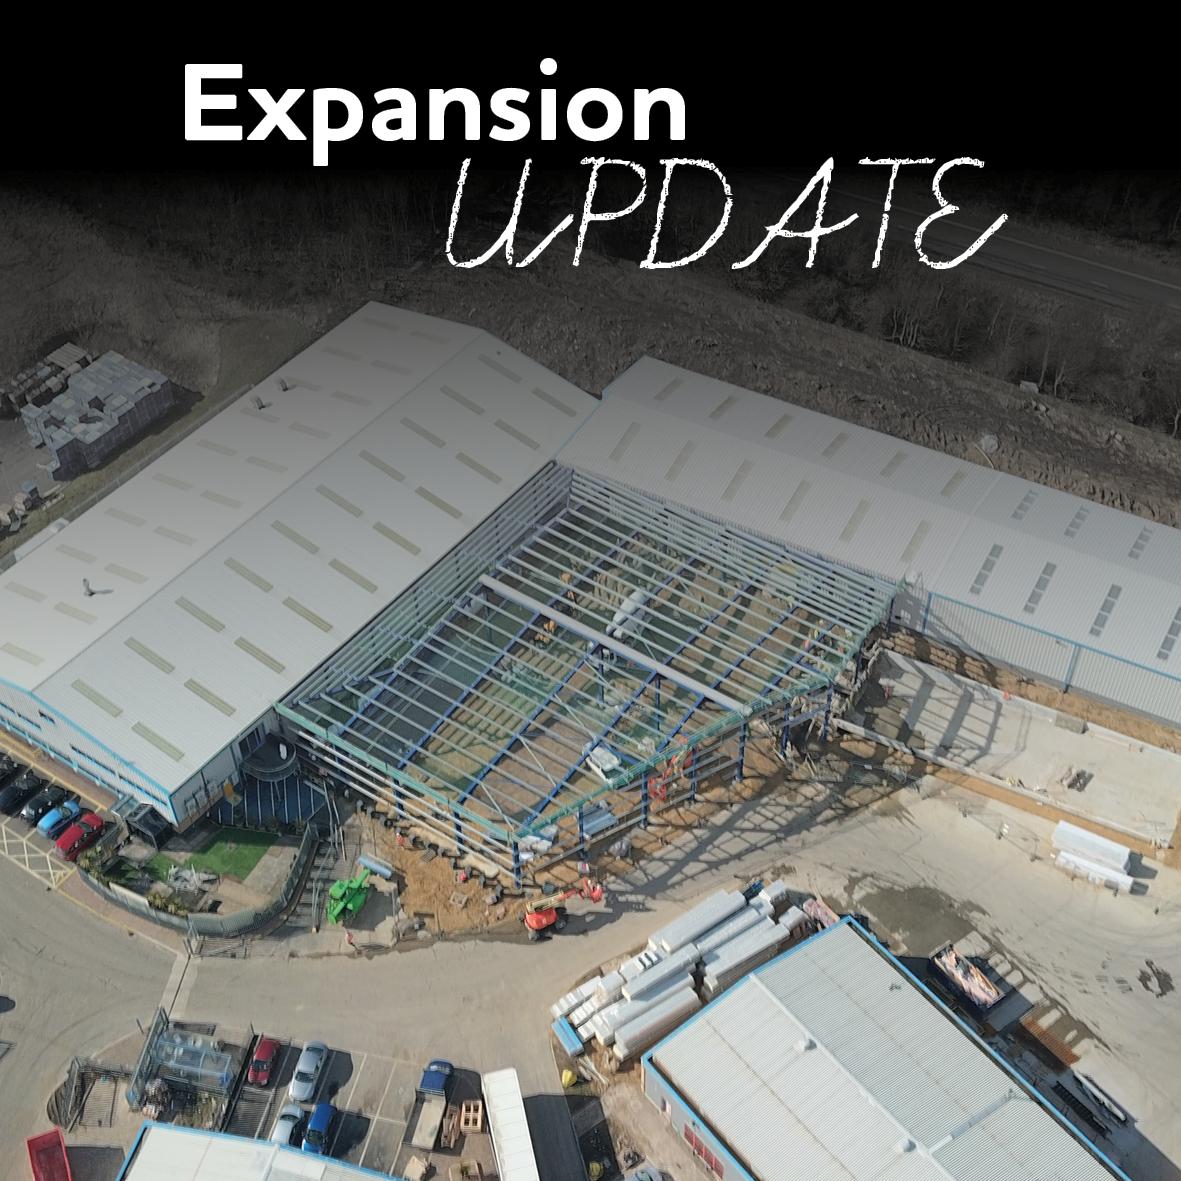 Prima Expansion Progress